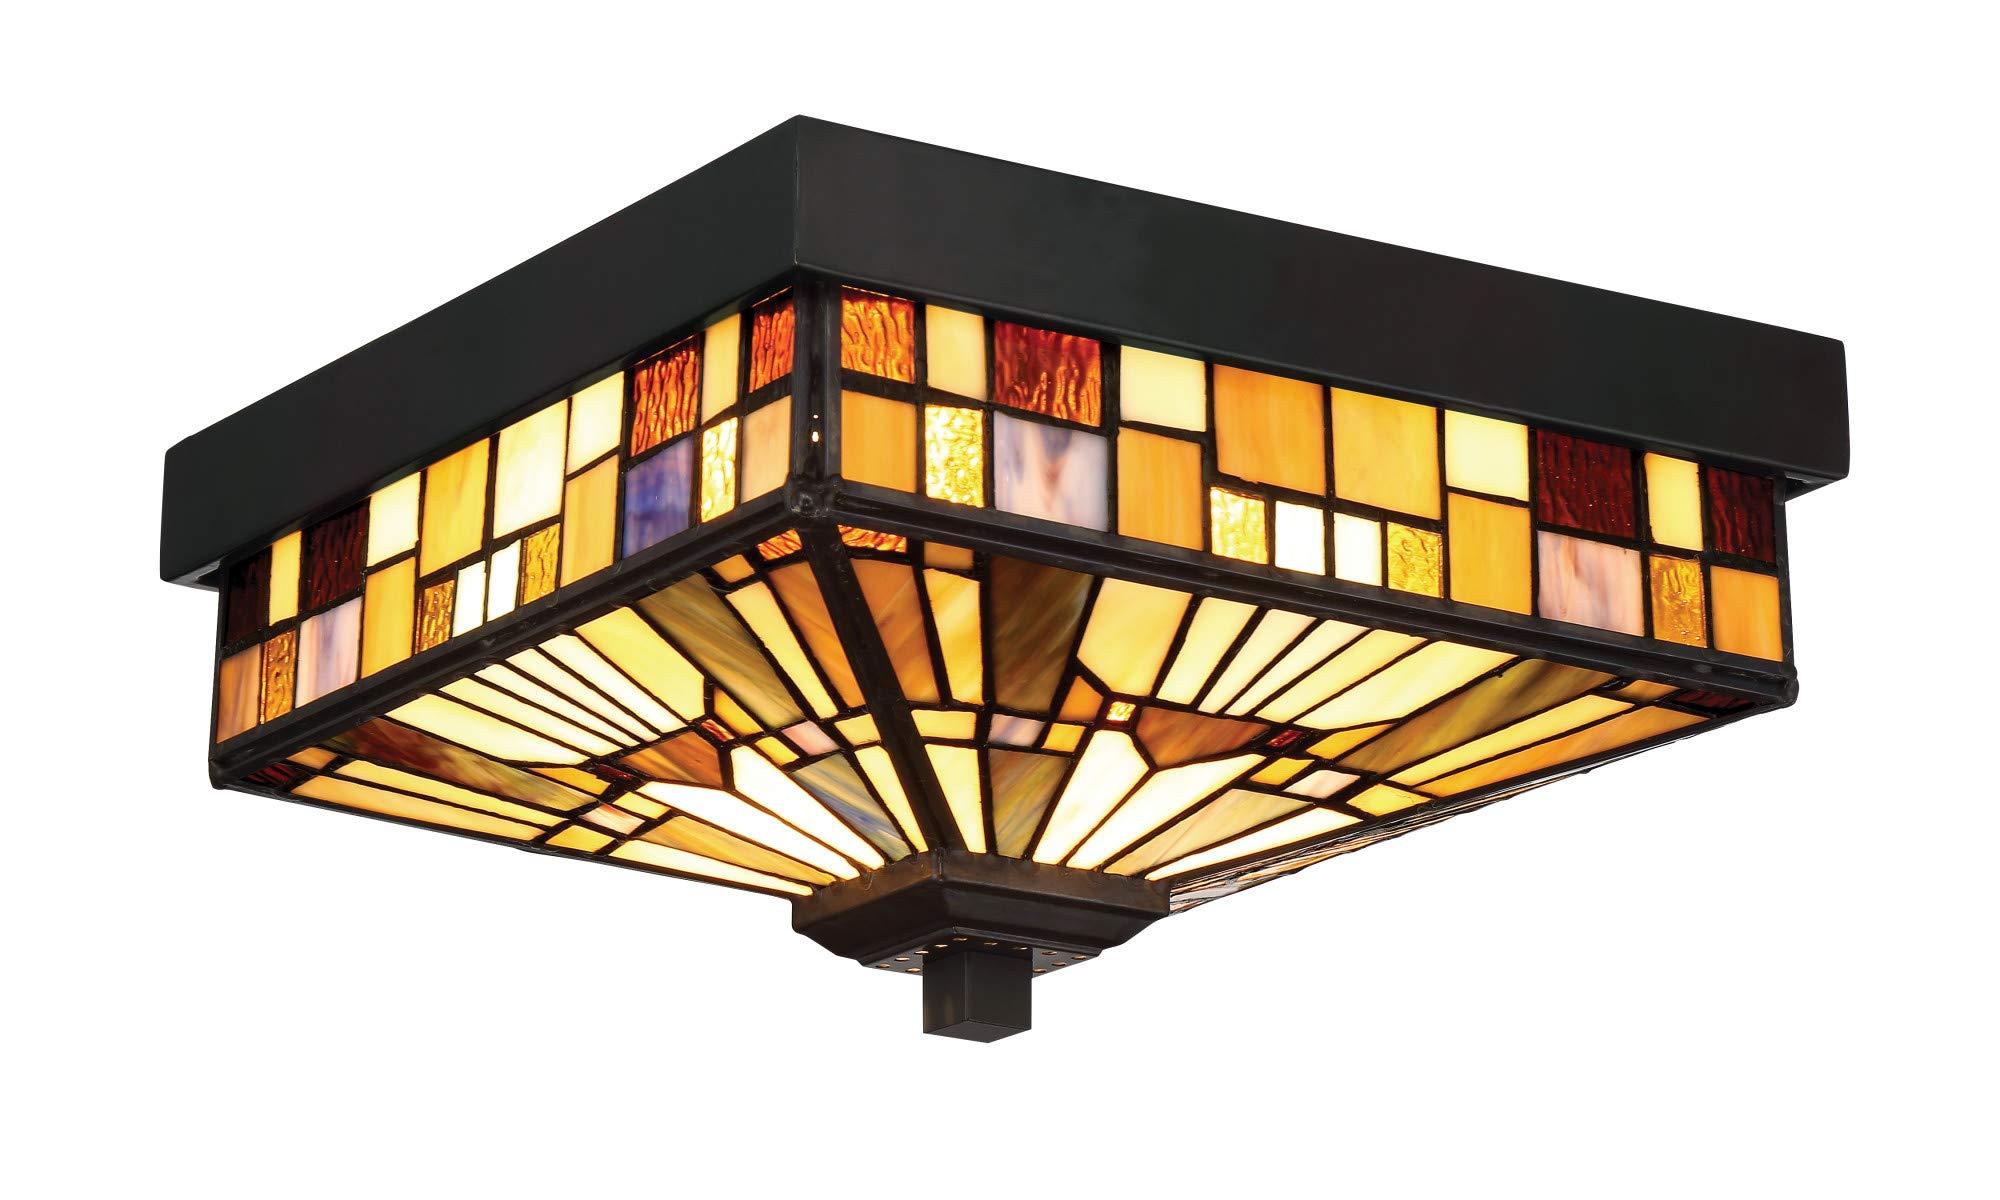 Quoizel TFIK1611VA Inglenook Outdoor Tiffany Mission Flush Mount Ceiling Lighting, 2-Light, 120 Watts, Valiant Bronze (6'' H x 11'' W)